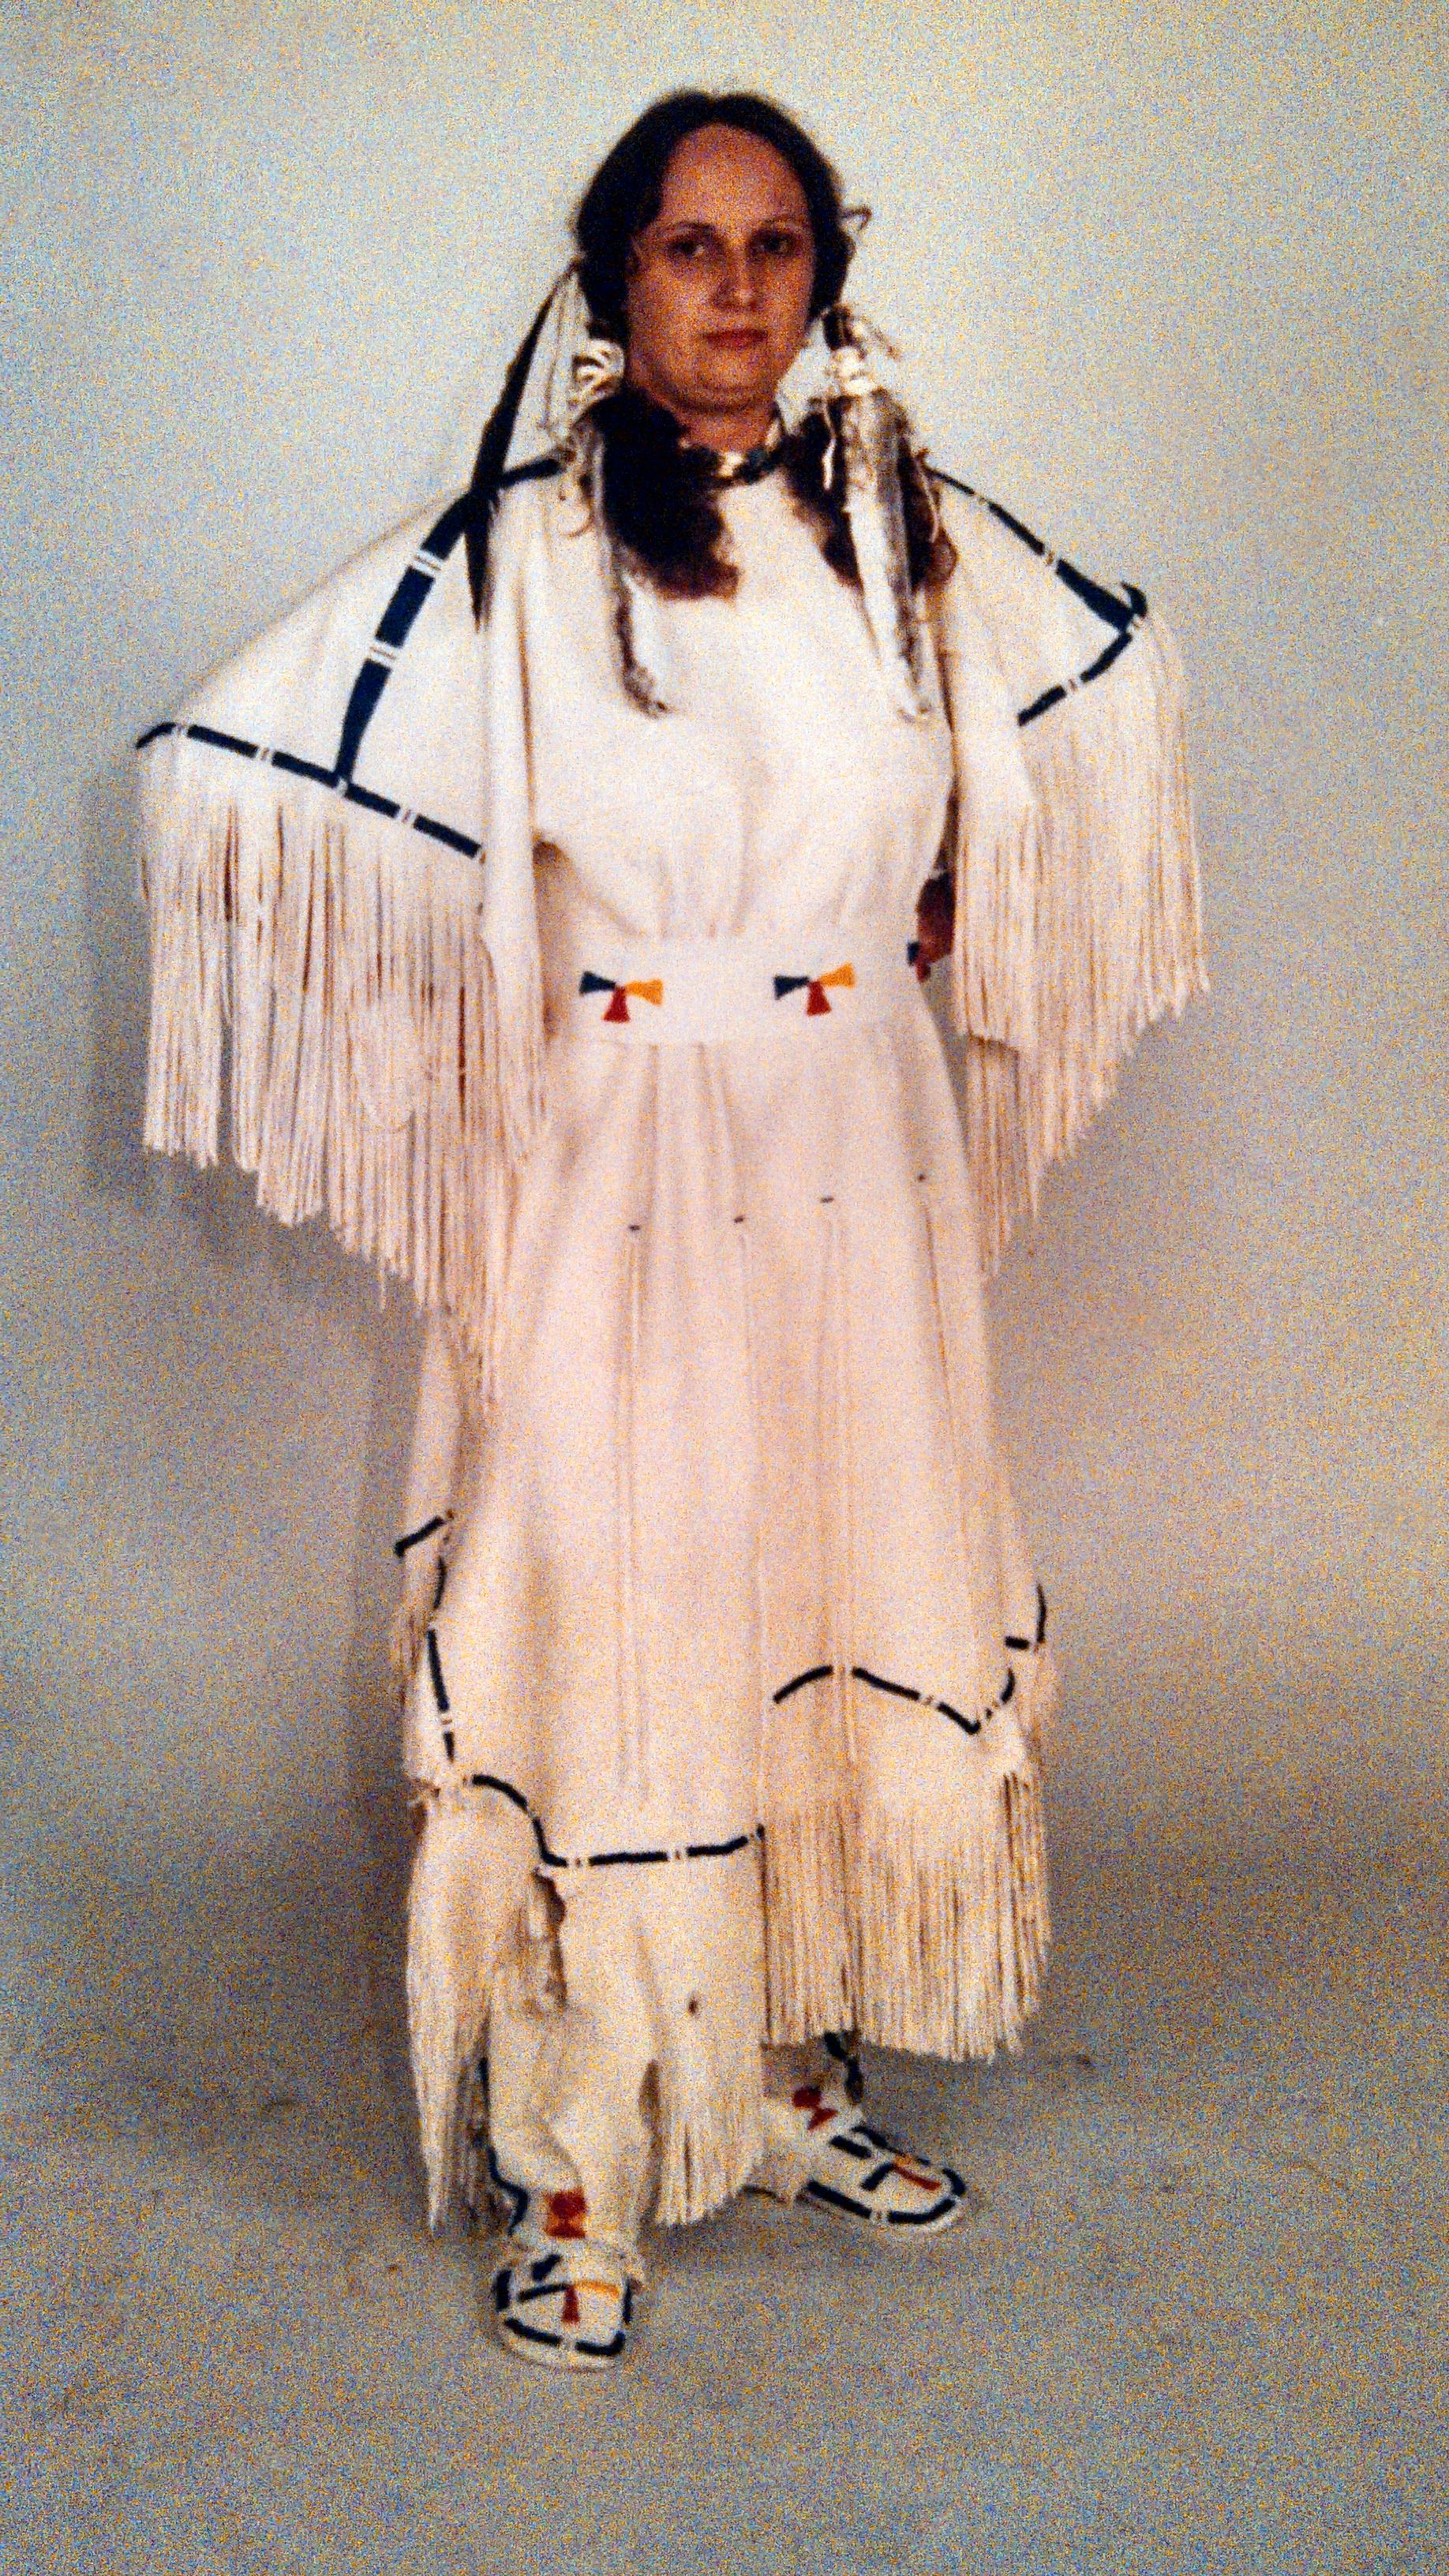 Lakota 3 hide style deerskin dress with leggings and moccasins